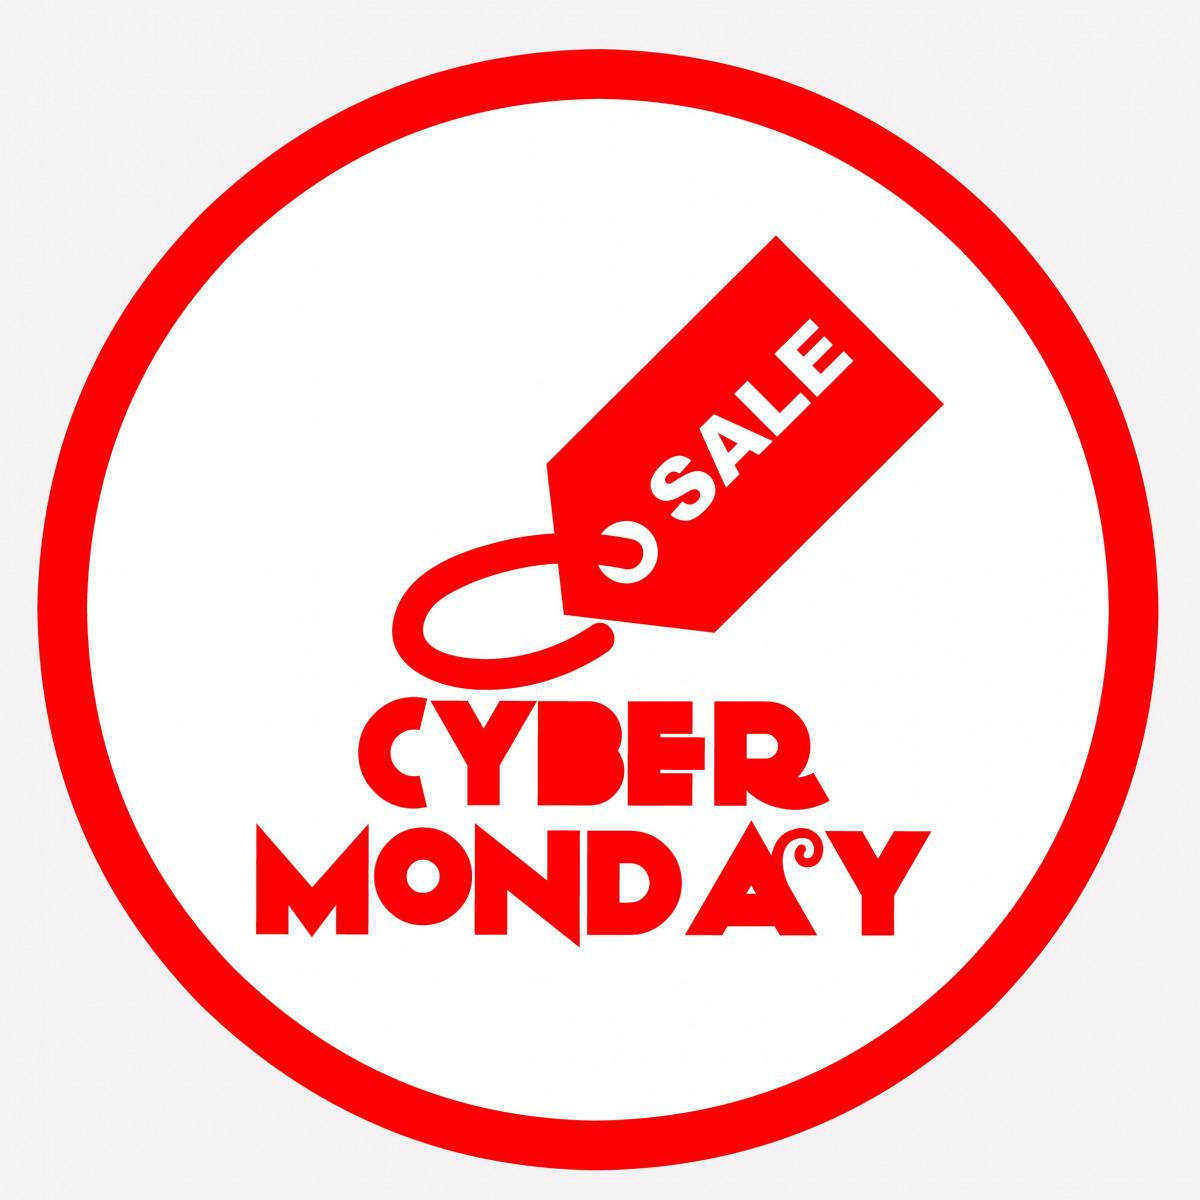 Patio furniture. Clip art of Cyber Monday Sale